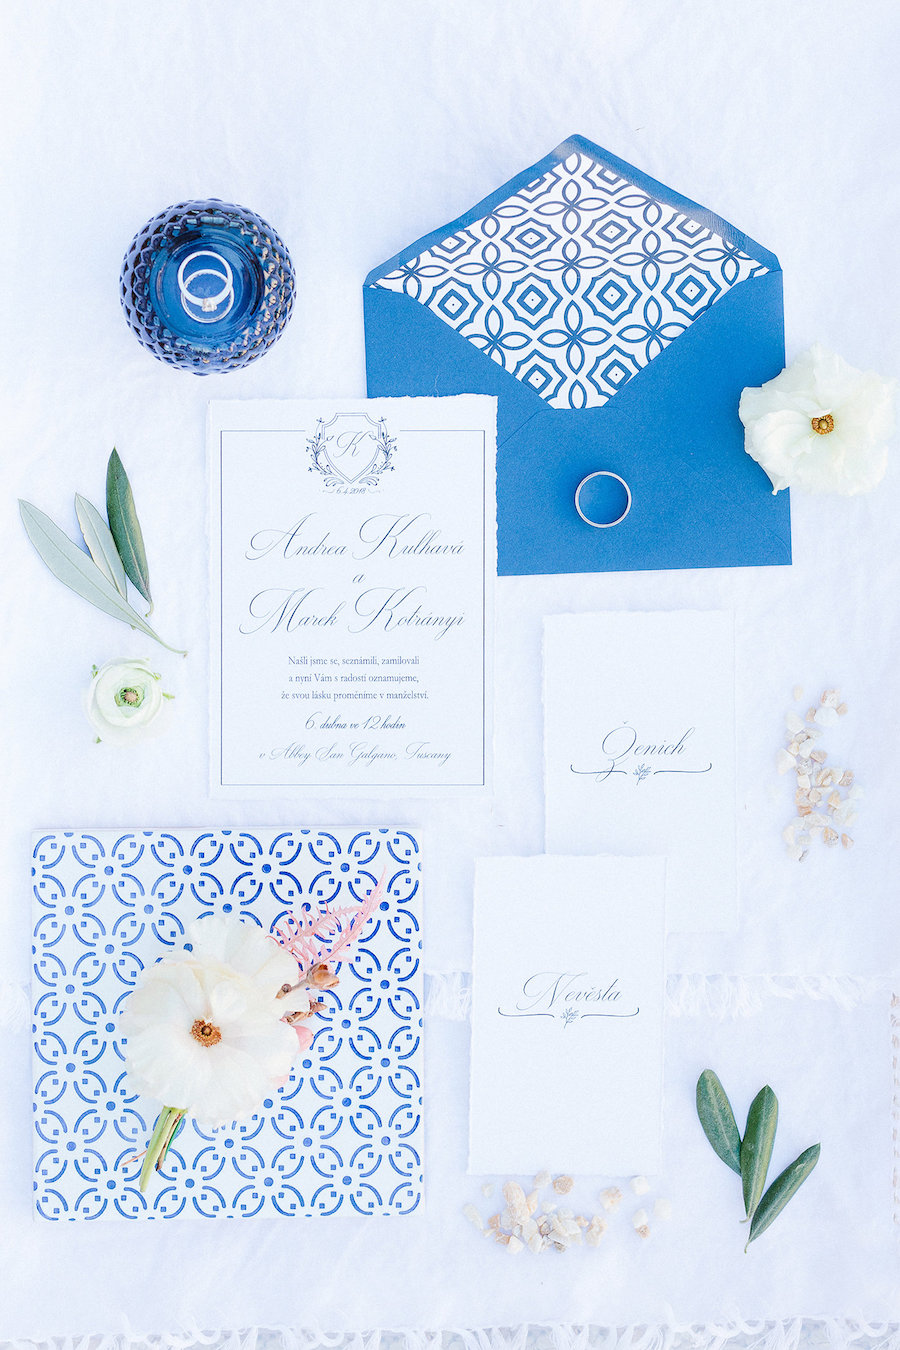 partecipazioni bianche e blu